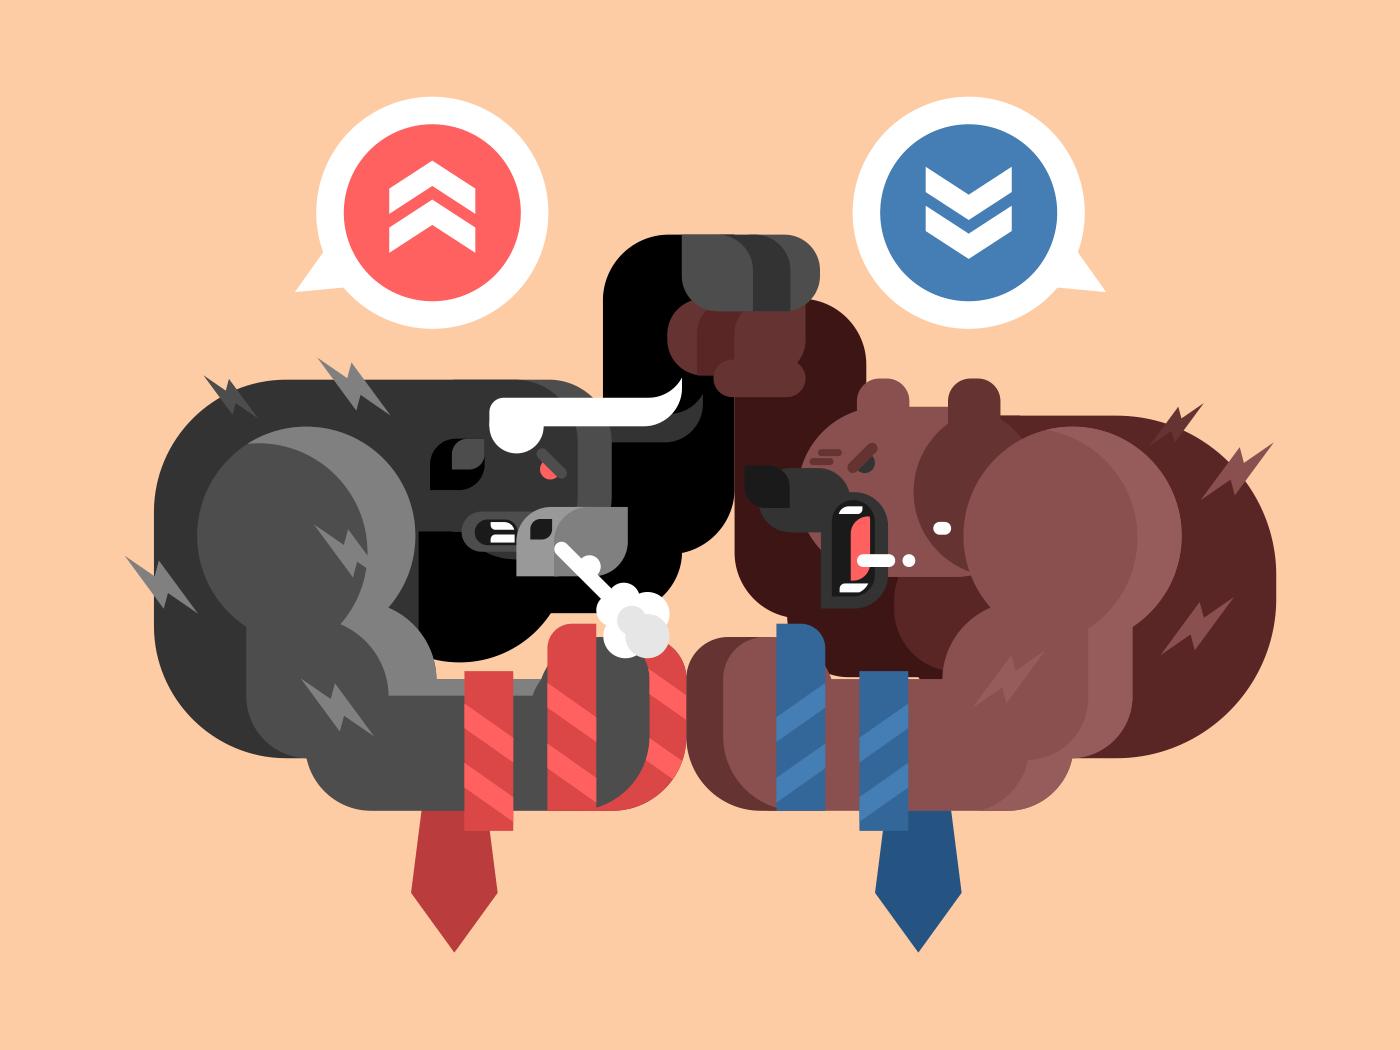 Bulls and bears fight flat vector illustration